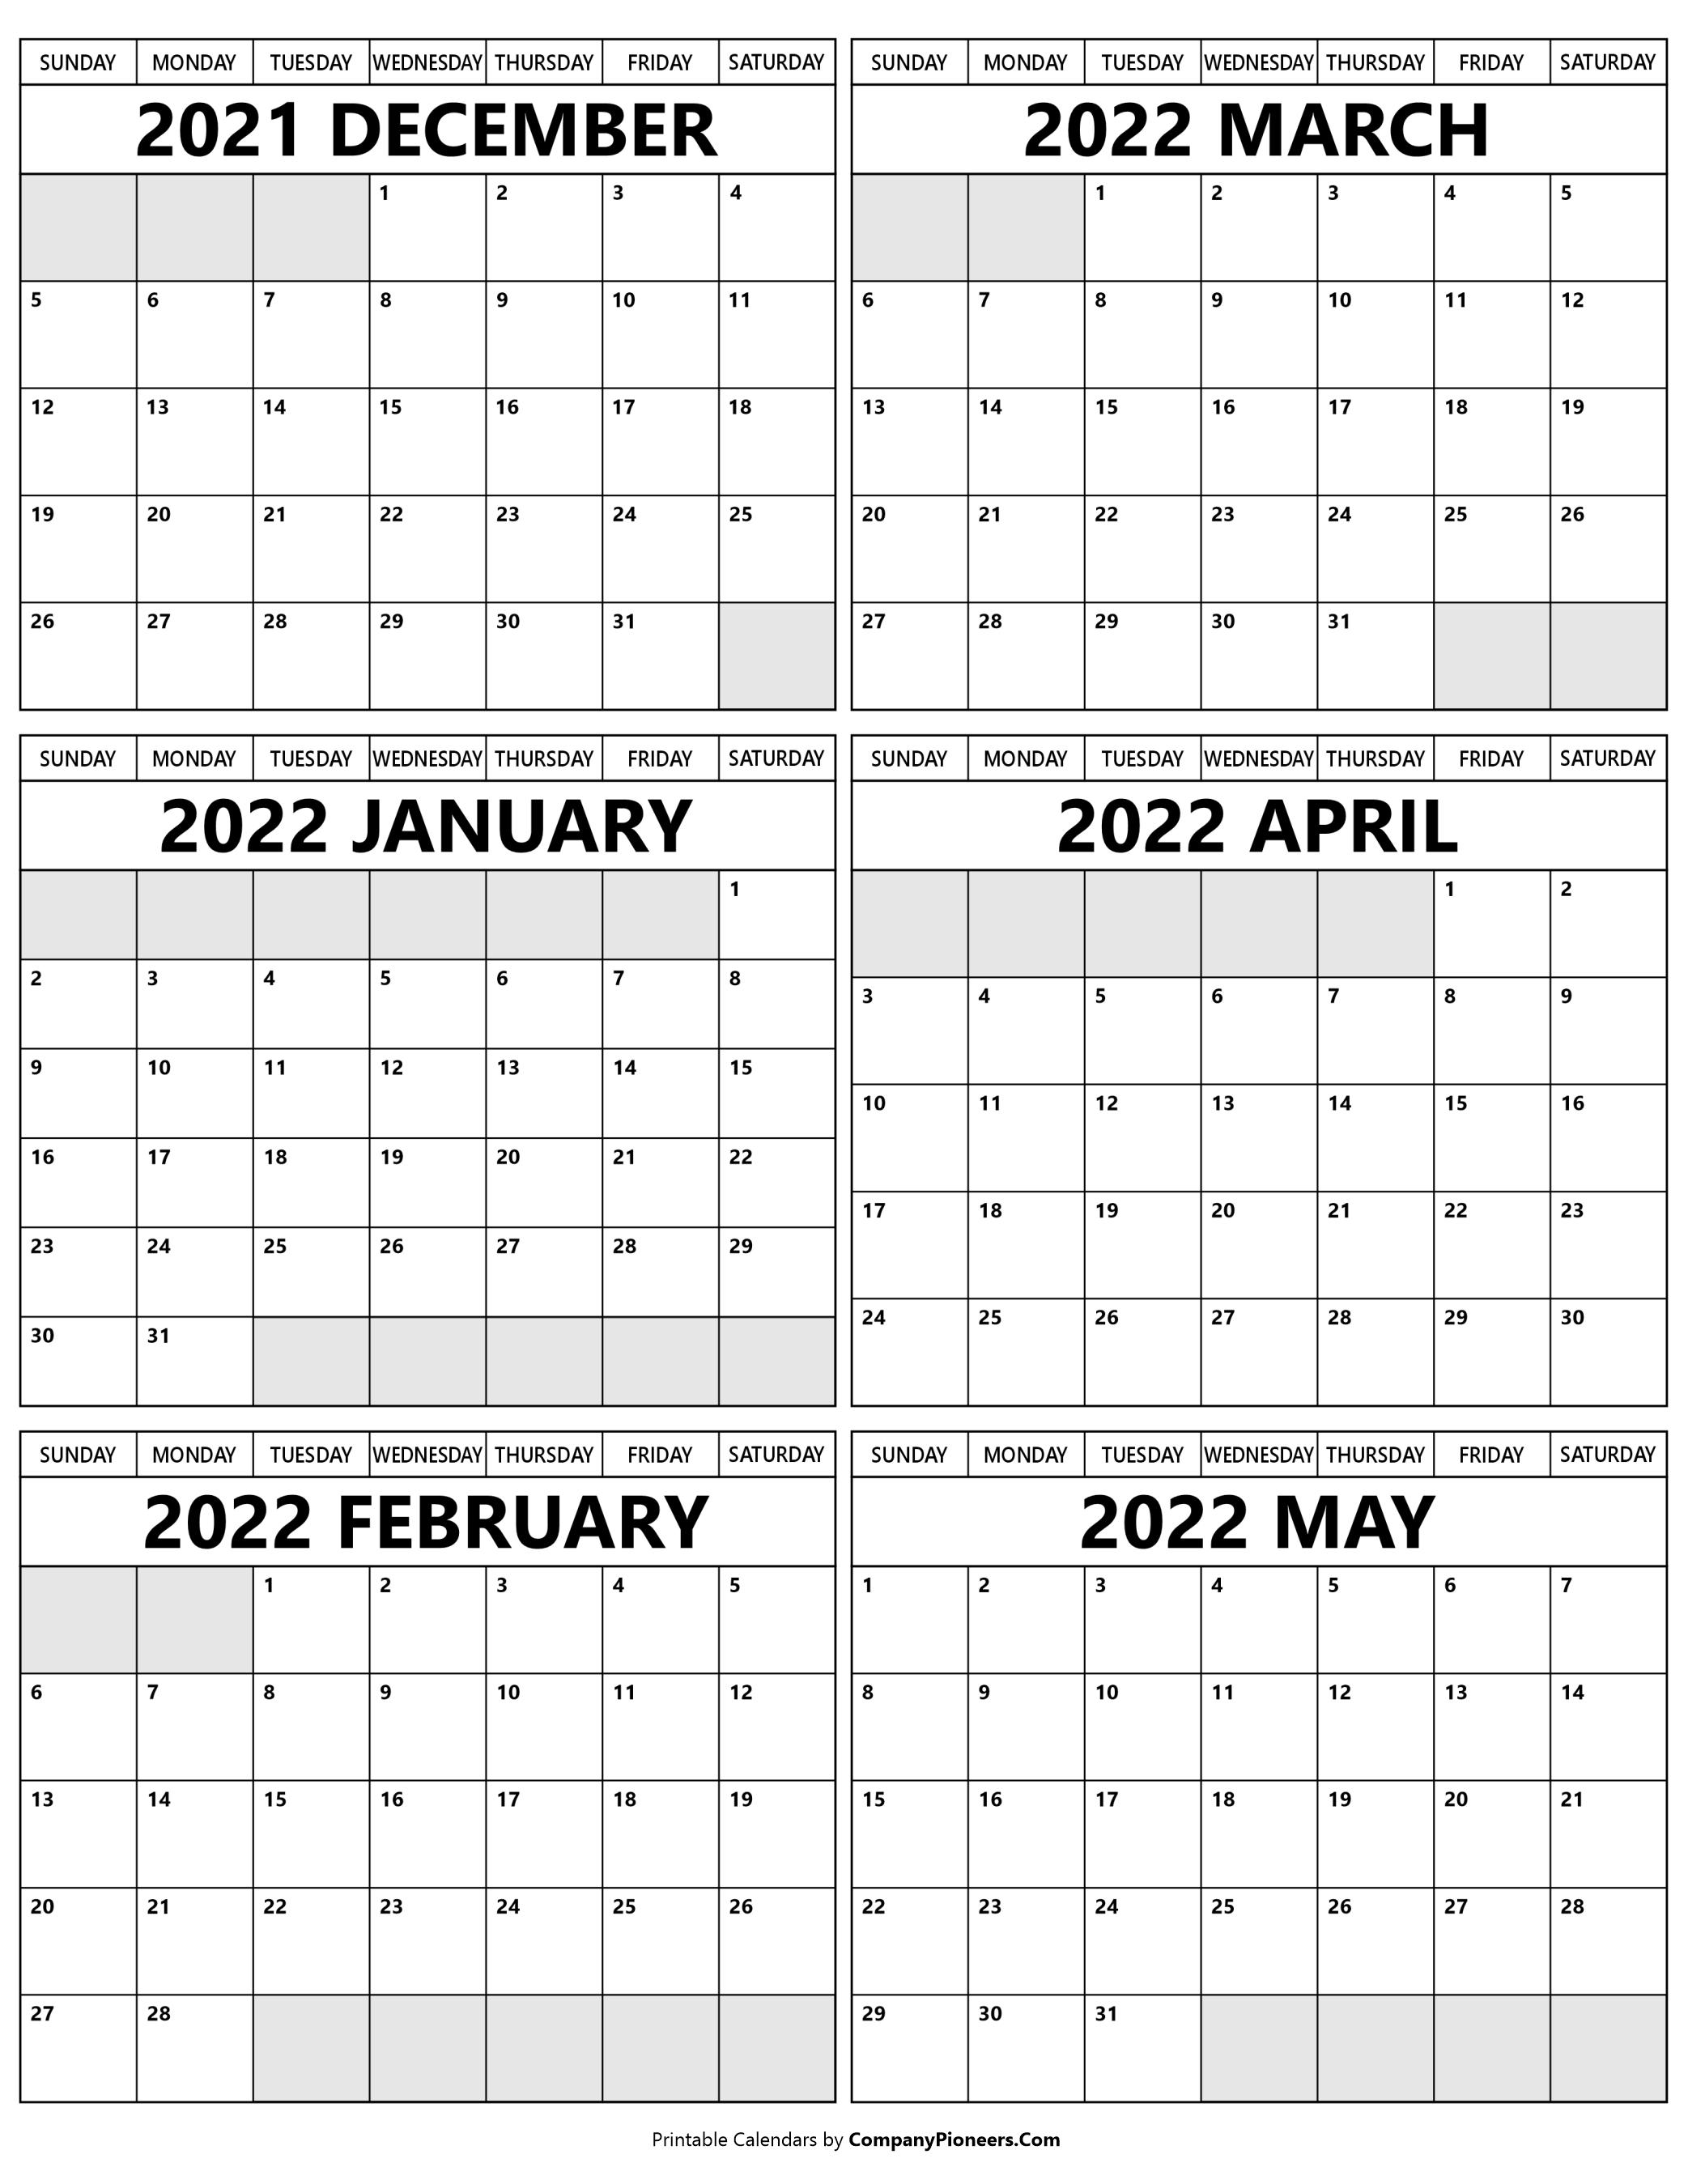 Printable December 2021 to May 2022 Calendar